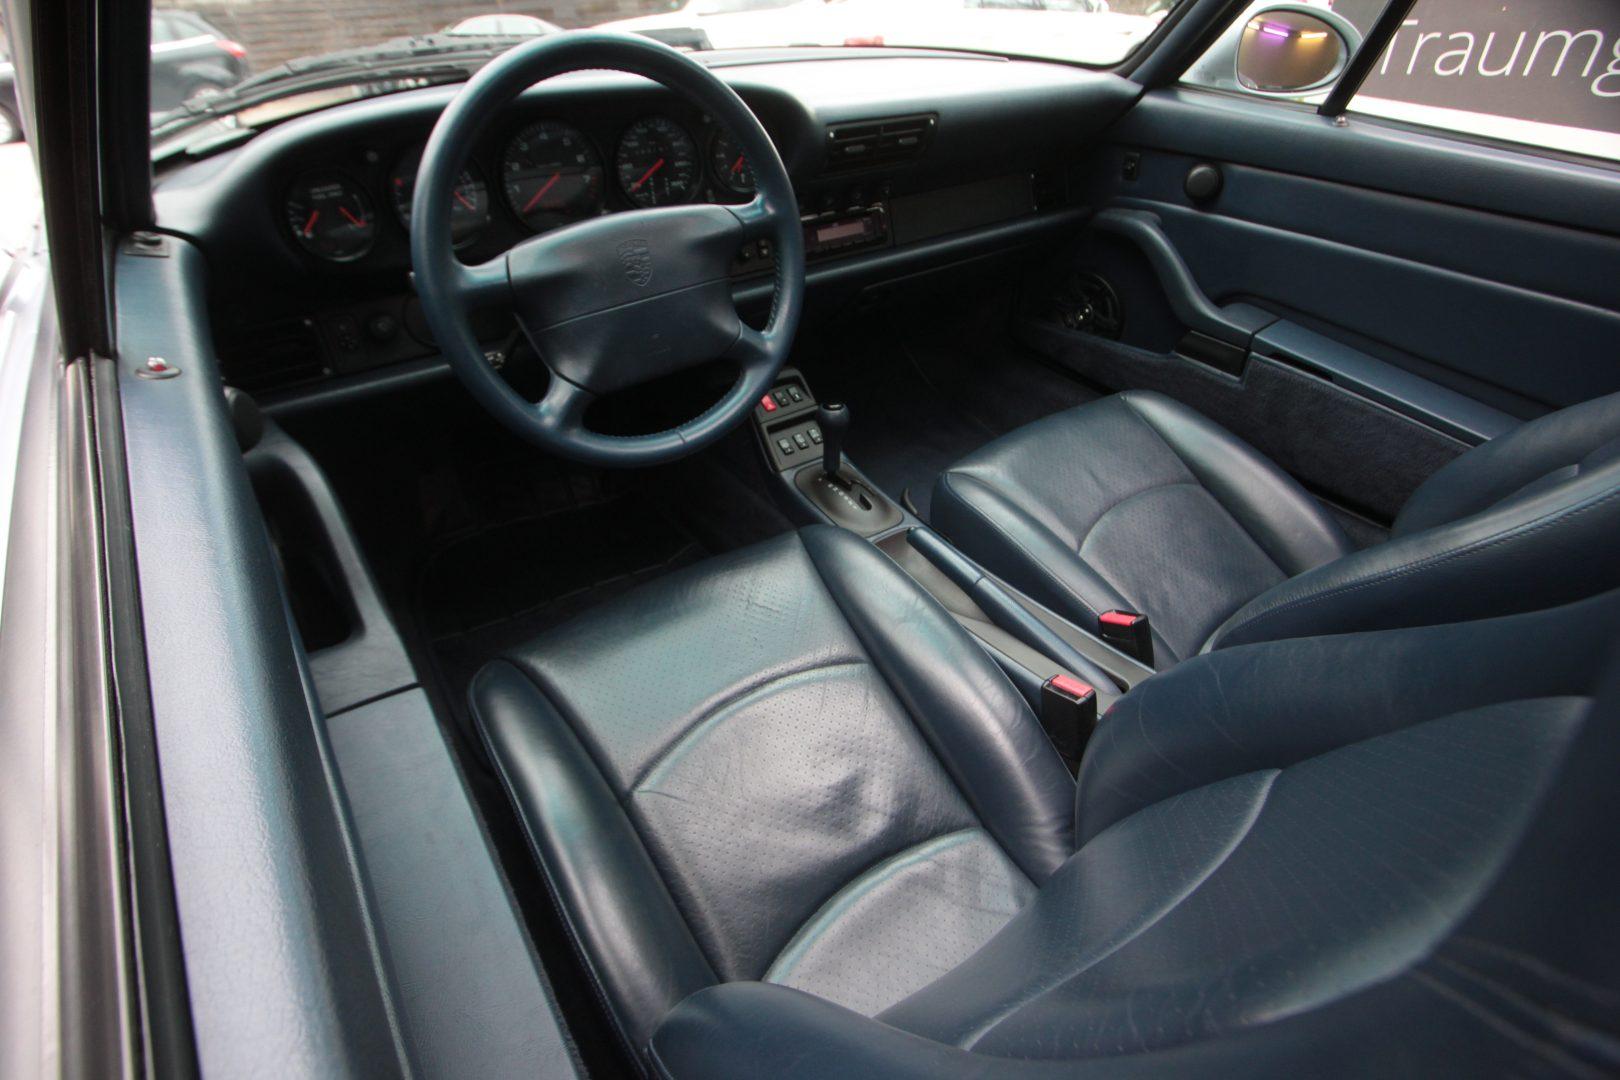 AIL Porsche 993 Carrera C2 3.6 Tiptronic 7